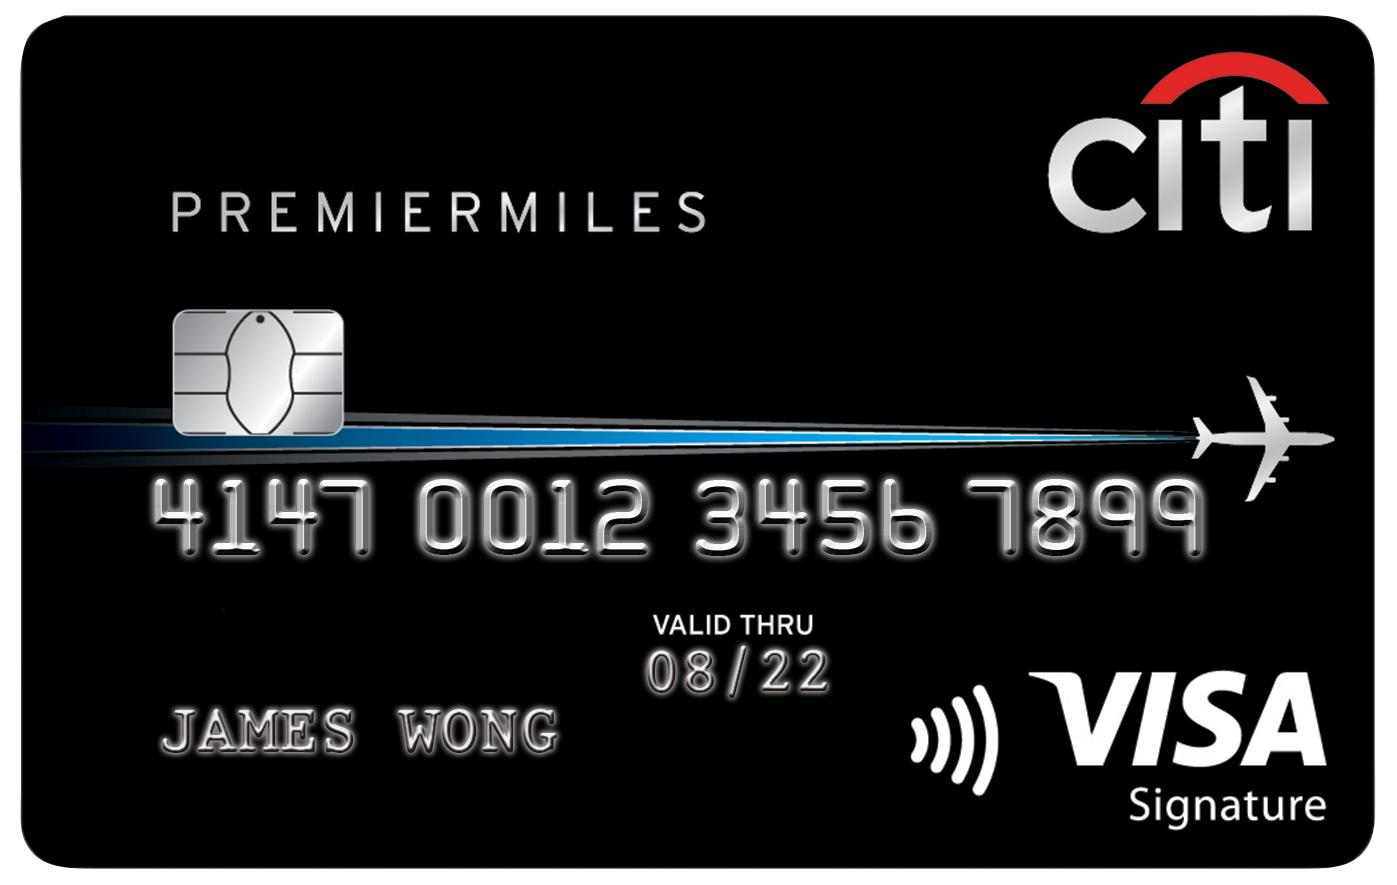 Citi Premier Miles Credit Card